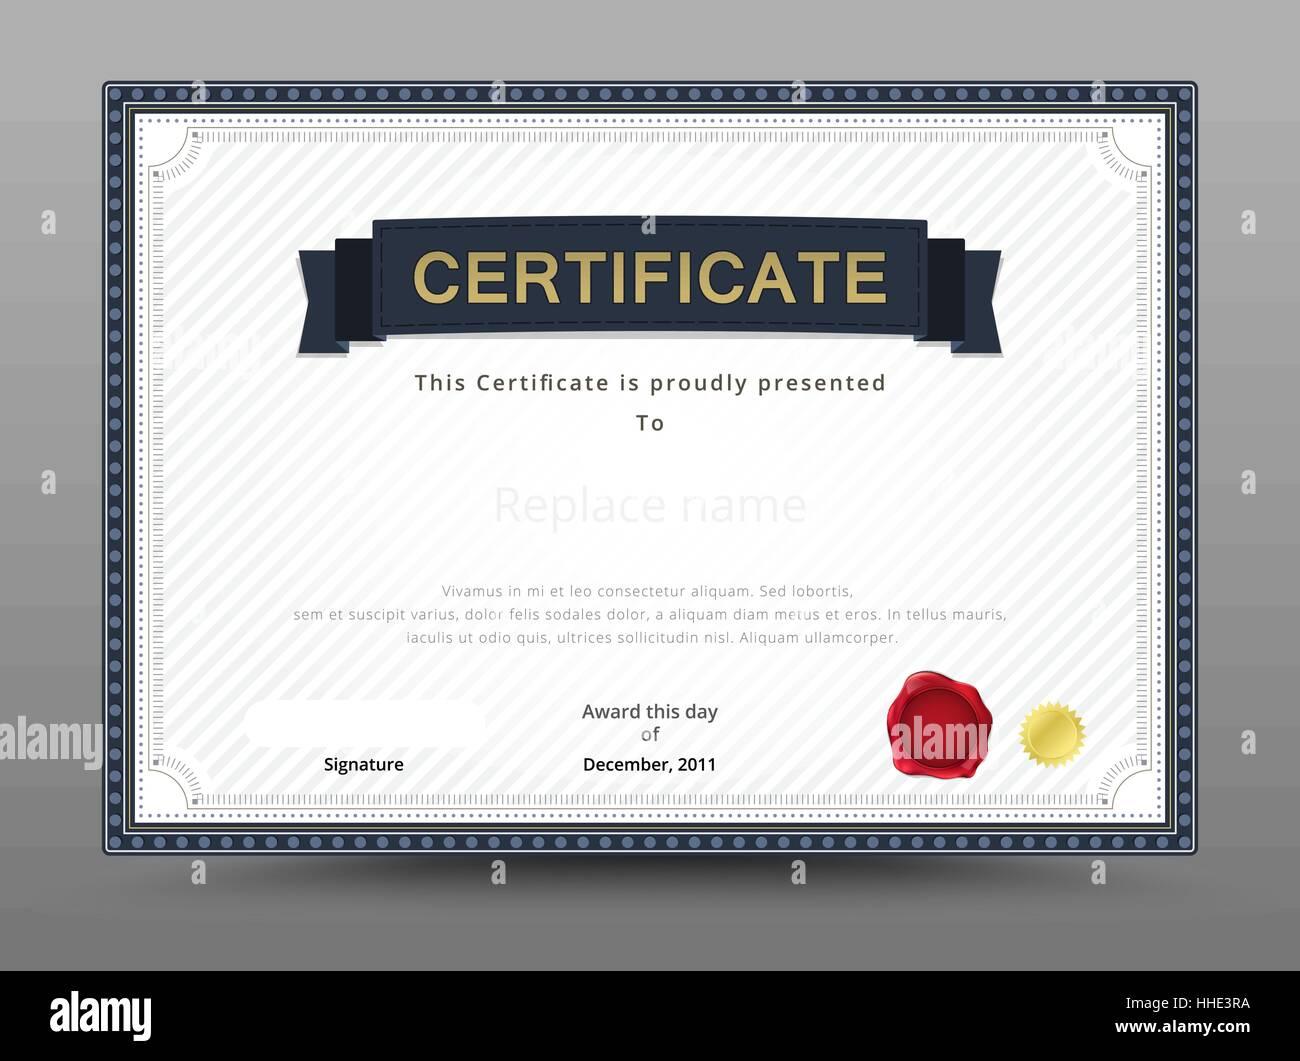 Elegant Certificate Template Business Certificate Formal Theme – Business Certificate Template